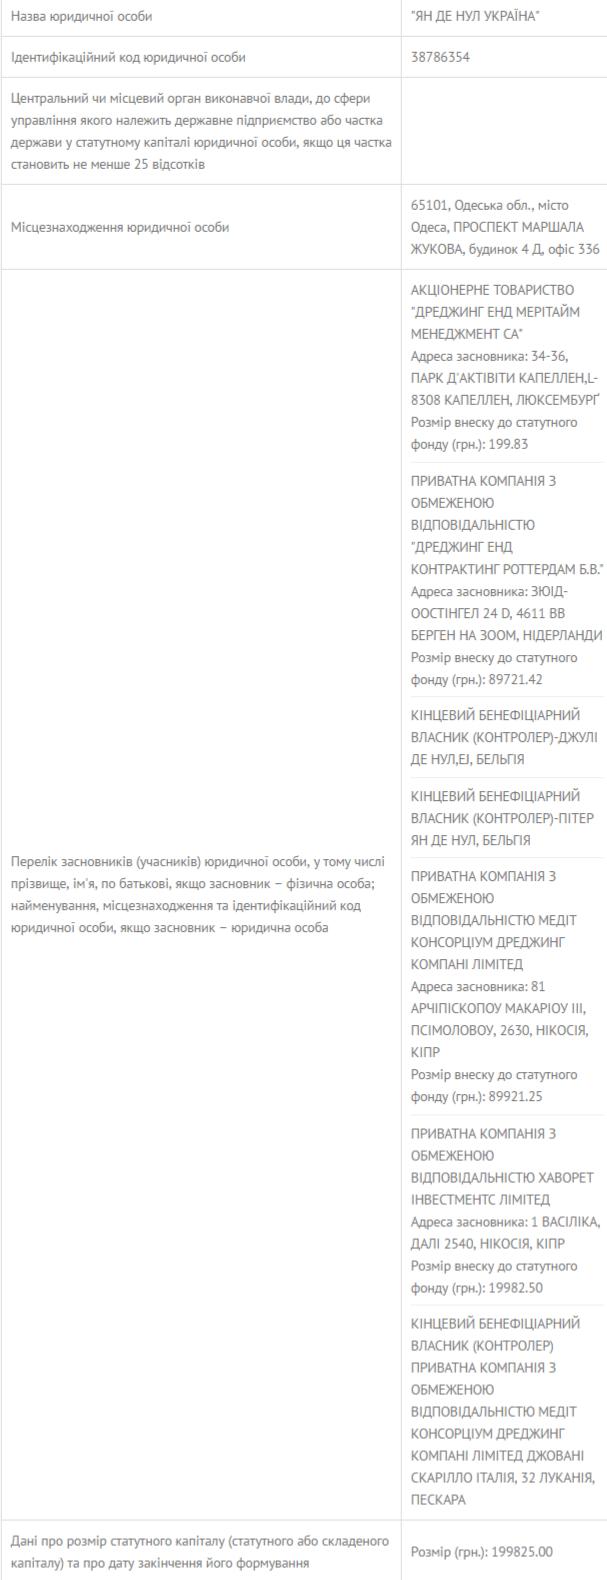 ян де нул украина